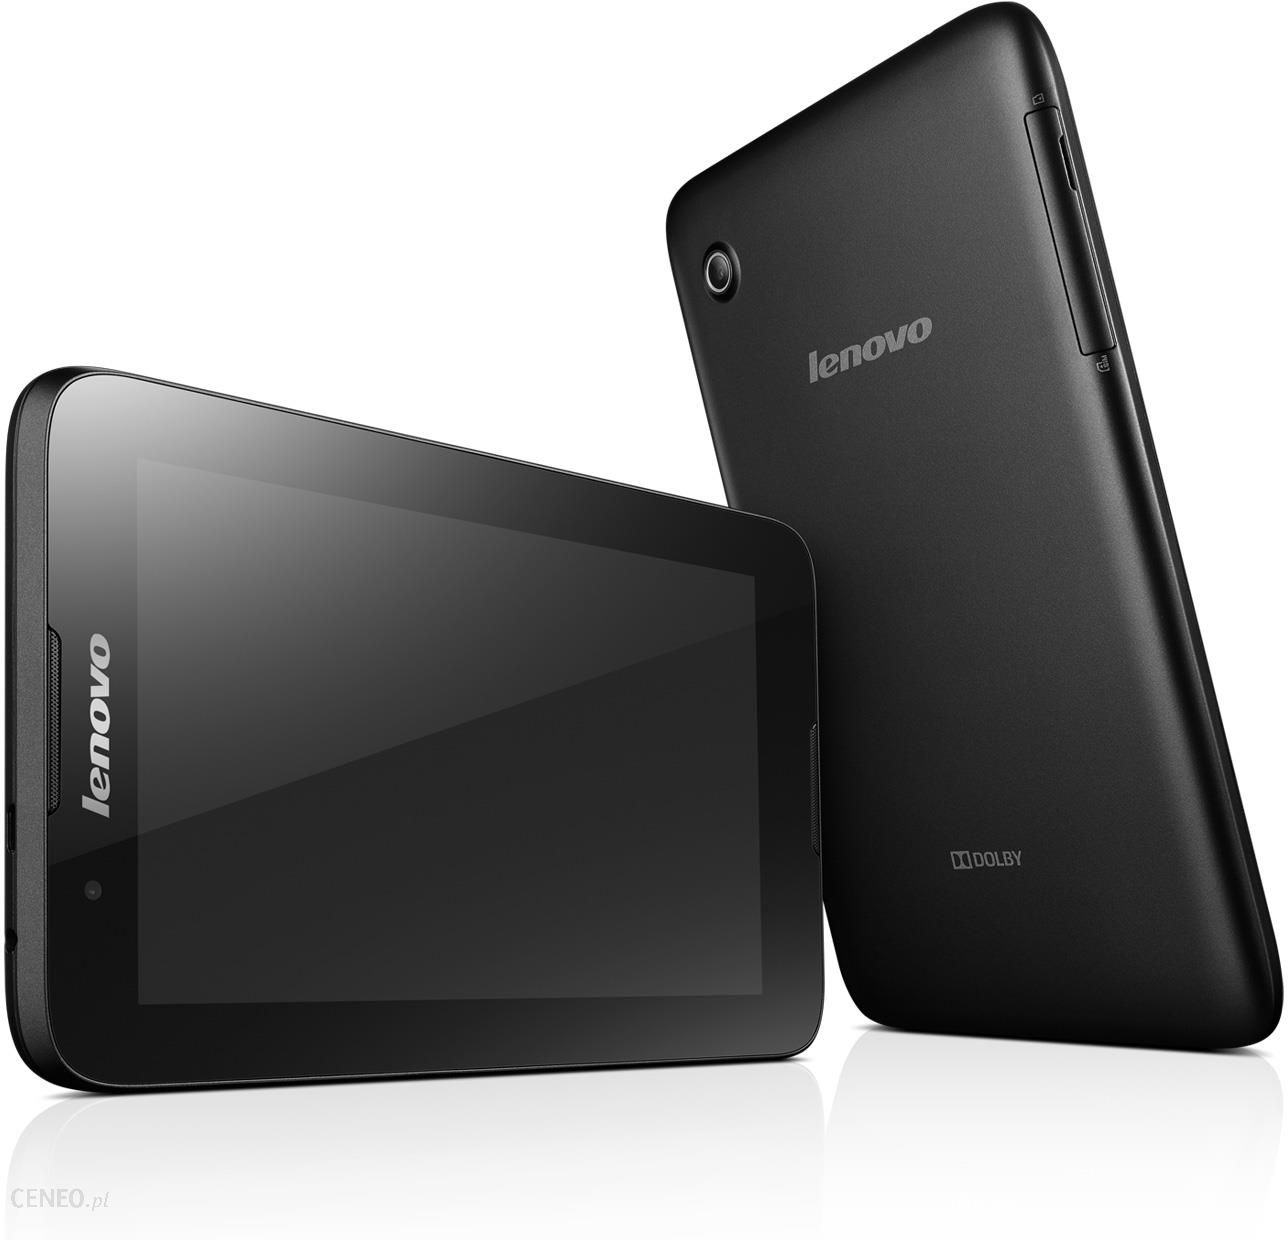 Tablet PC Lenovo Tab2 A7 30 8GB 3G Czarny 59